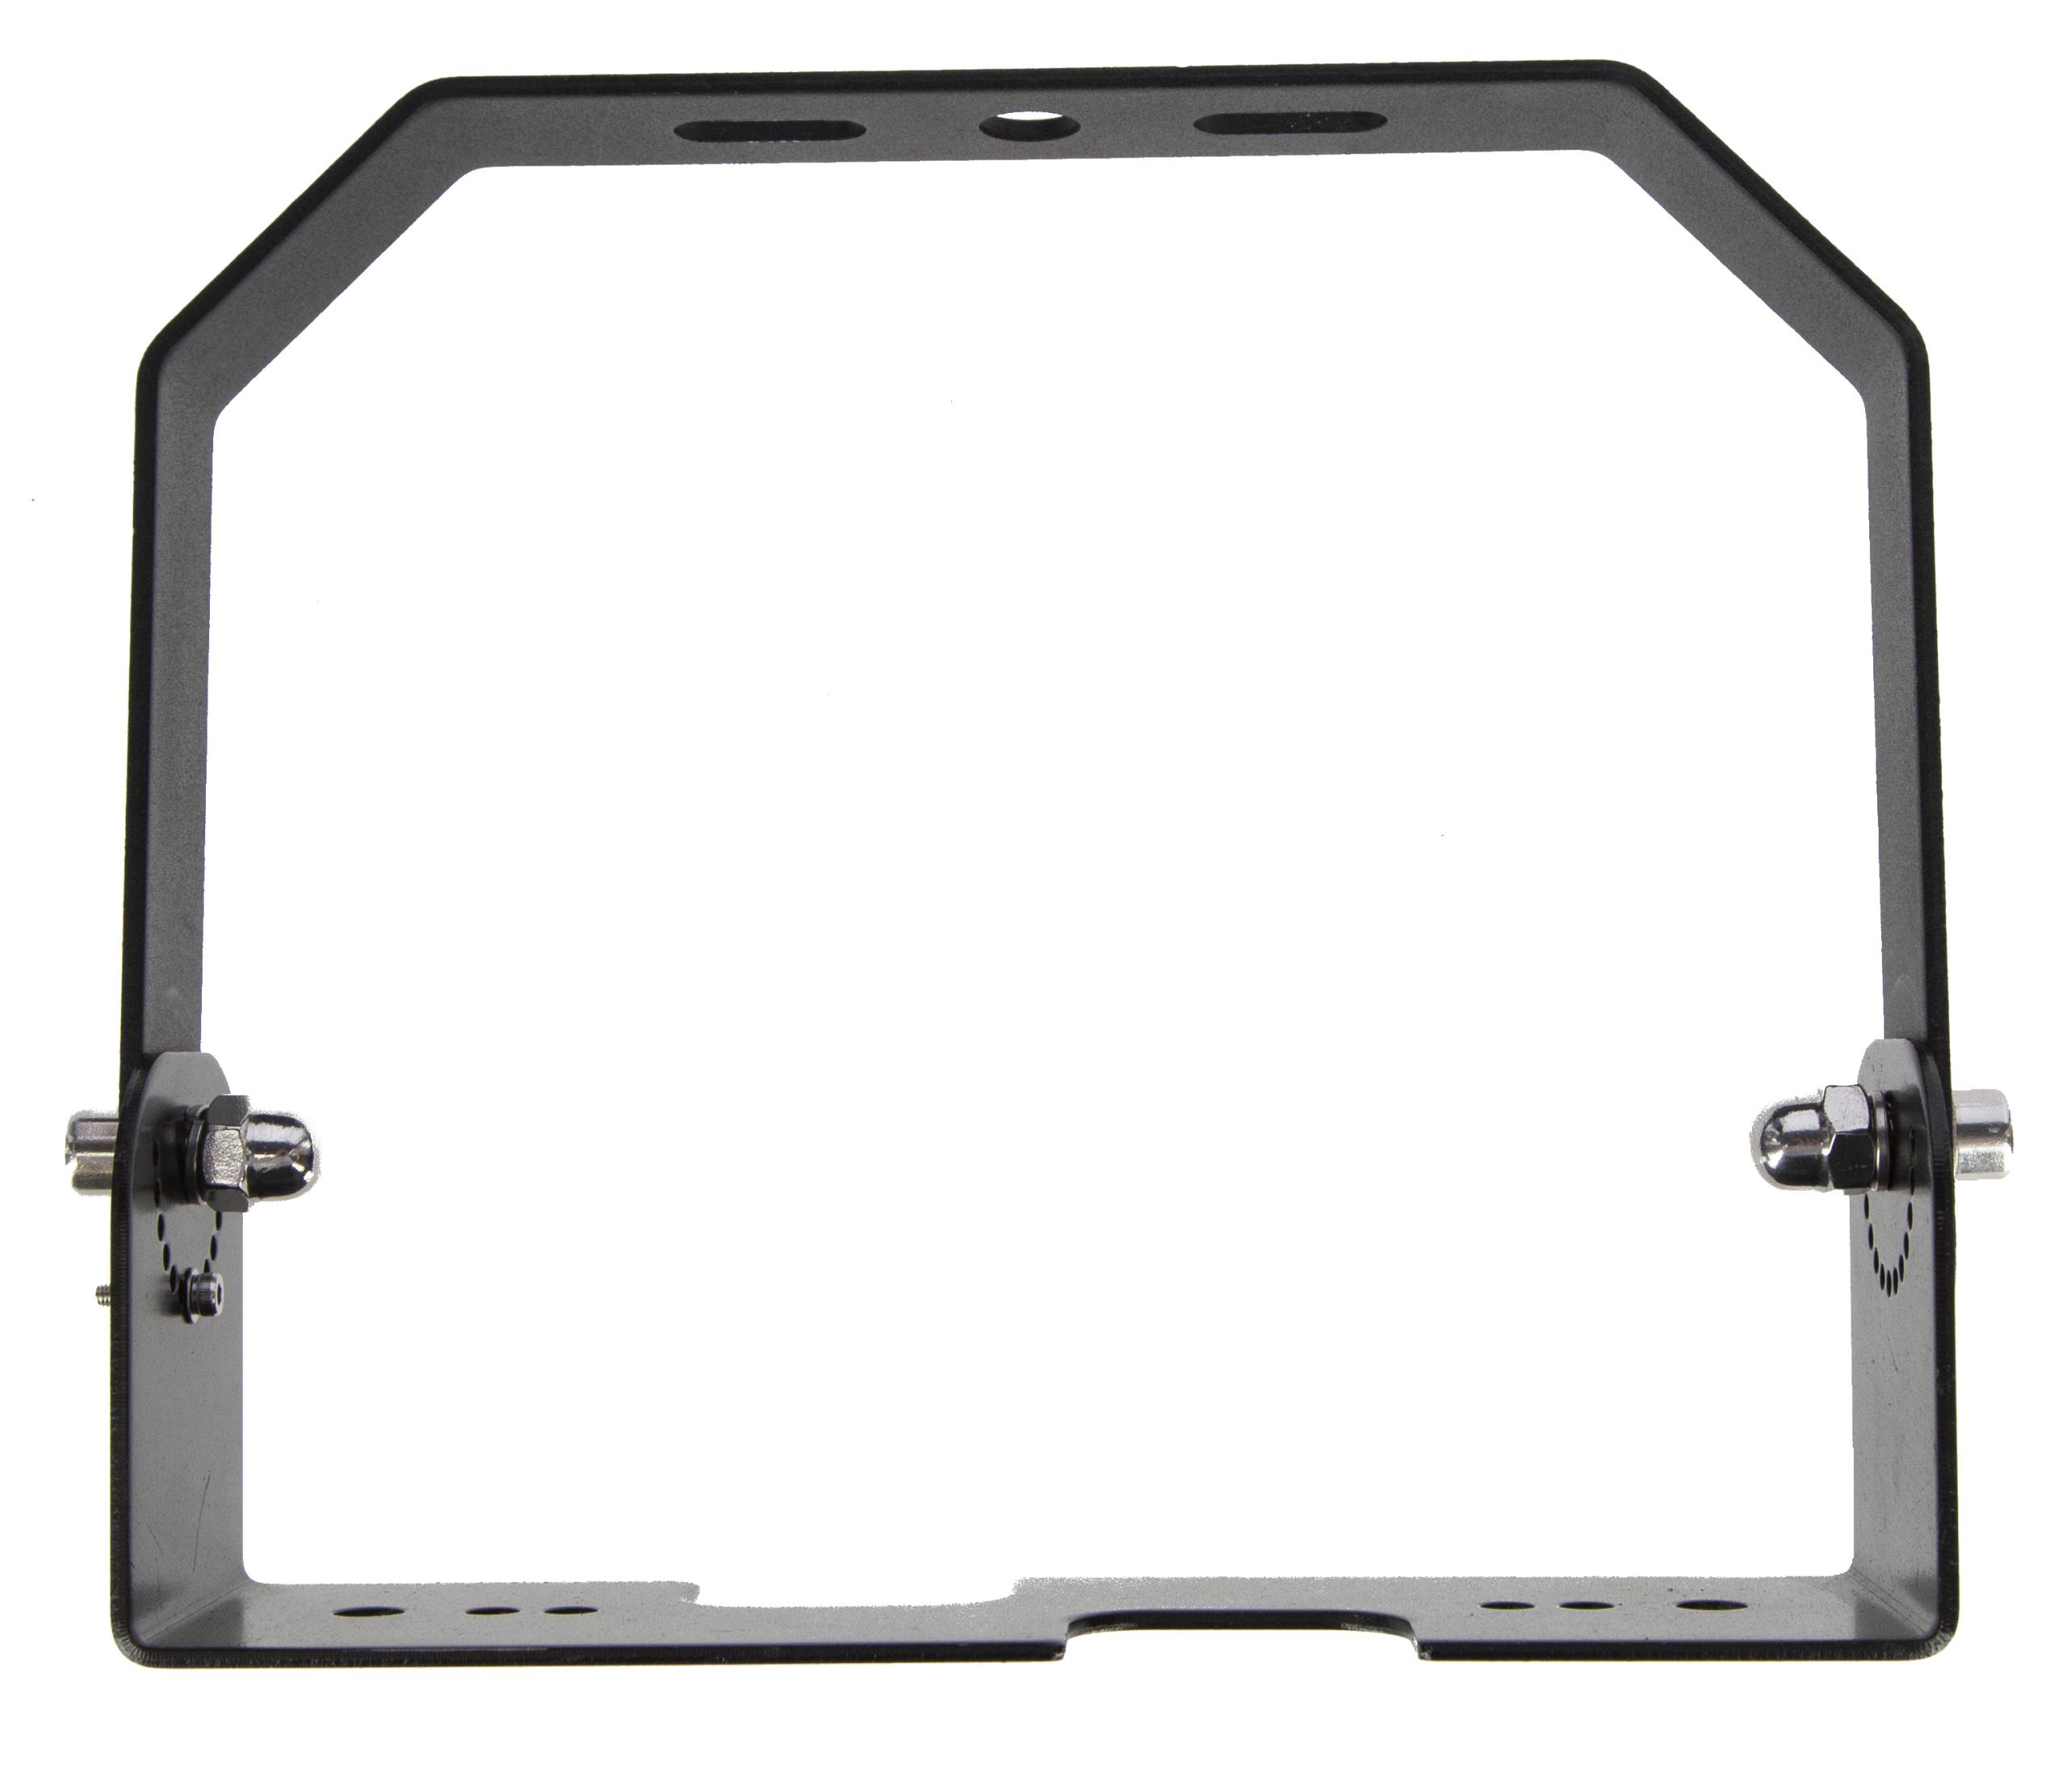 Aufhängeset (Platte&Bügel) f. LED Hallenstrahler, Mod. 2019